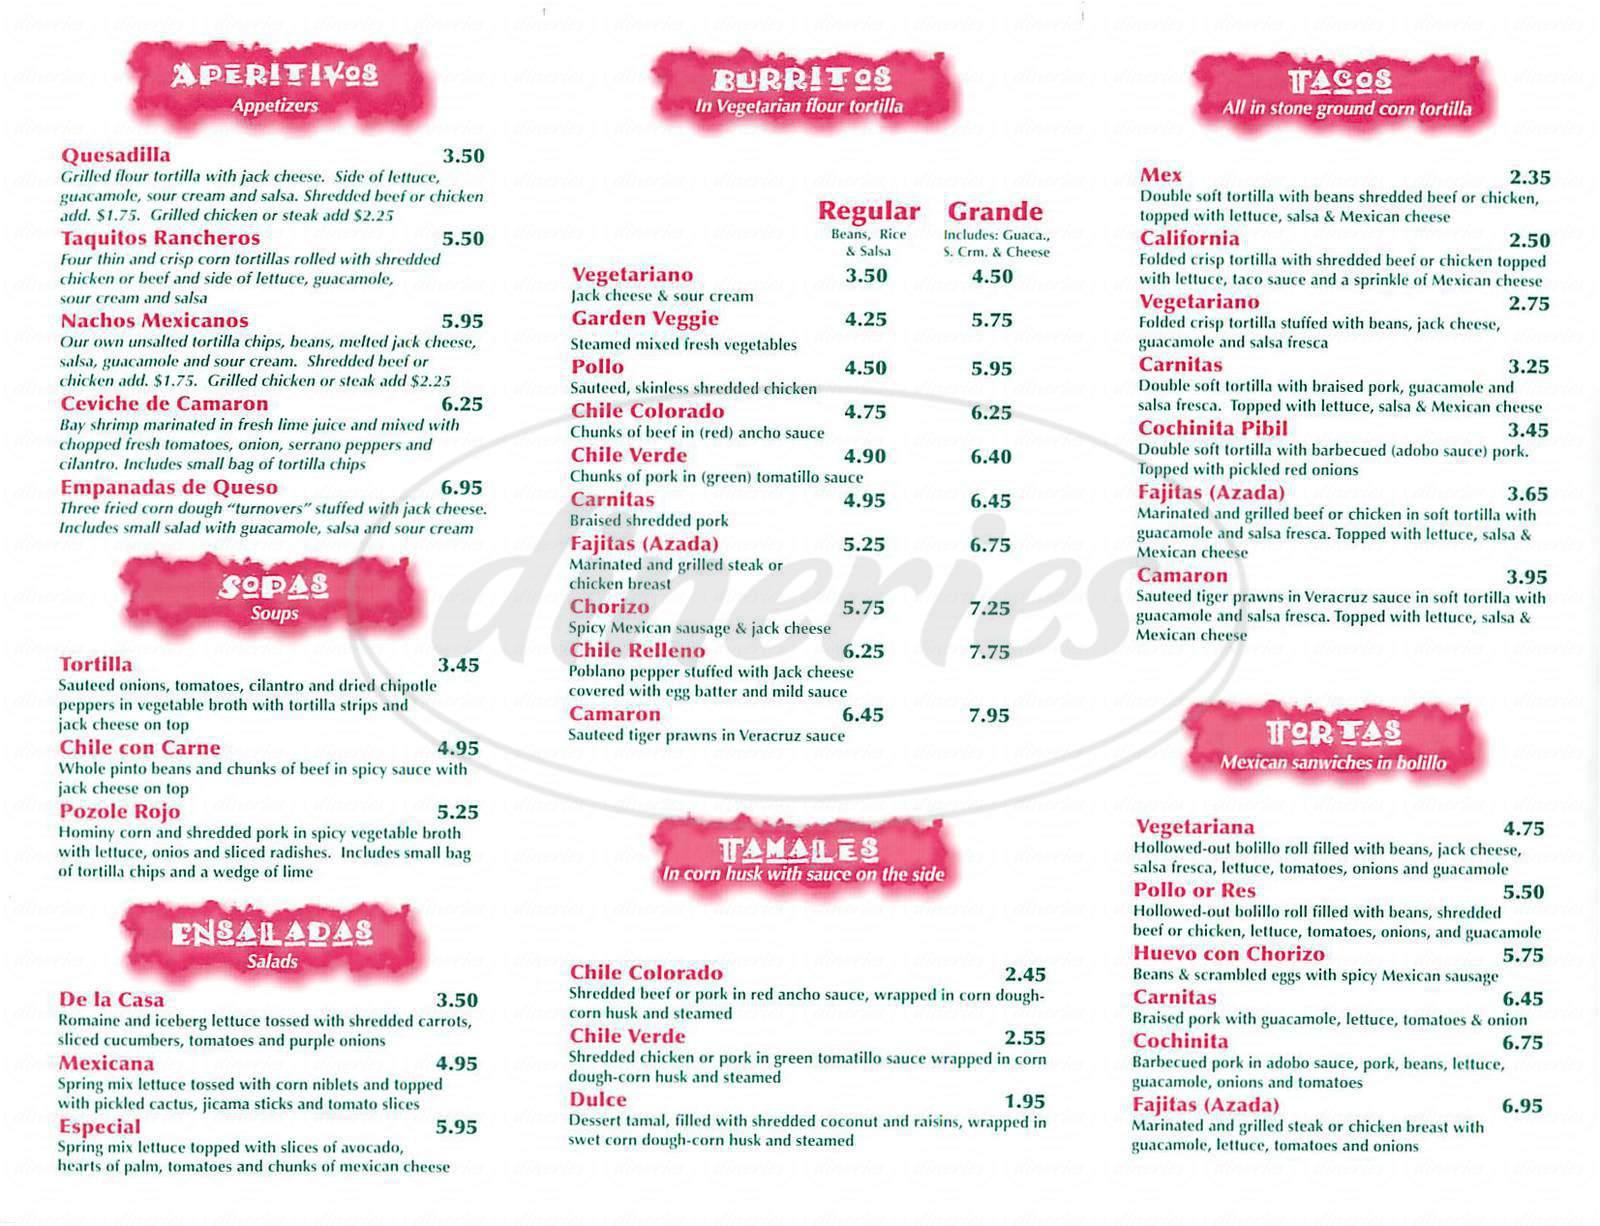 menu for La Canasta